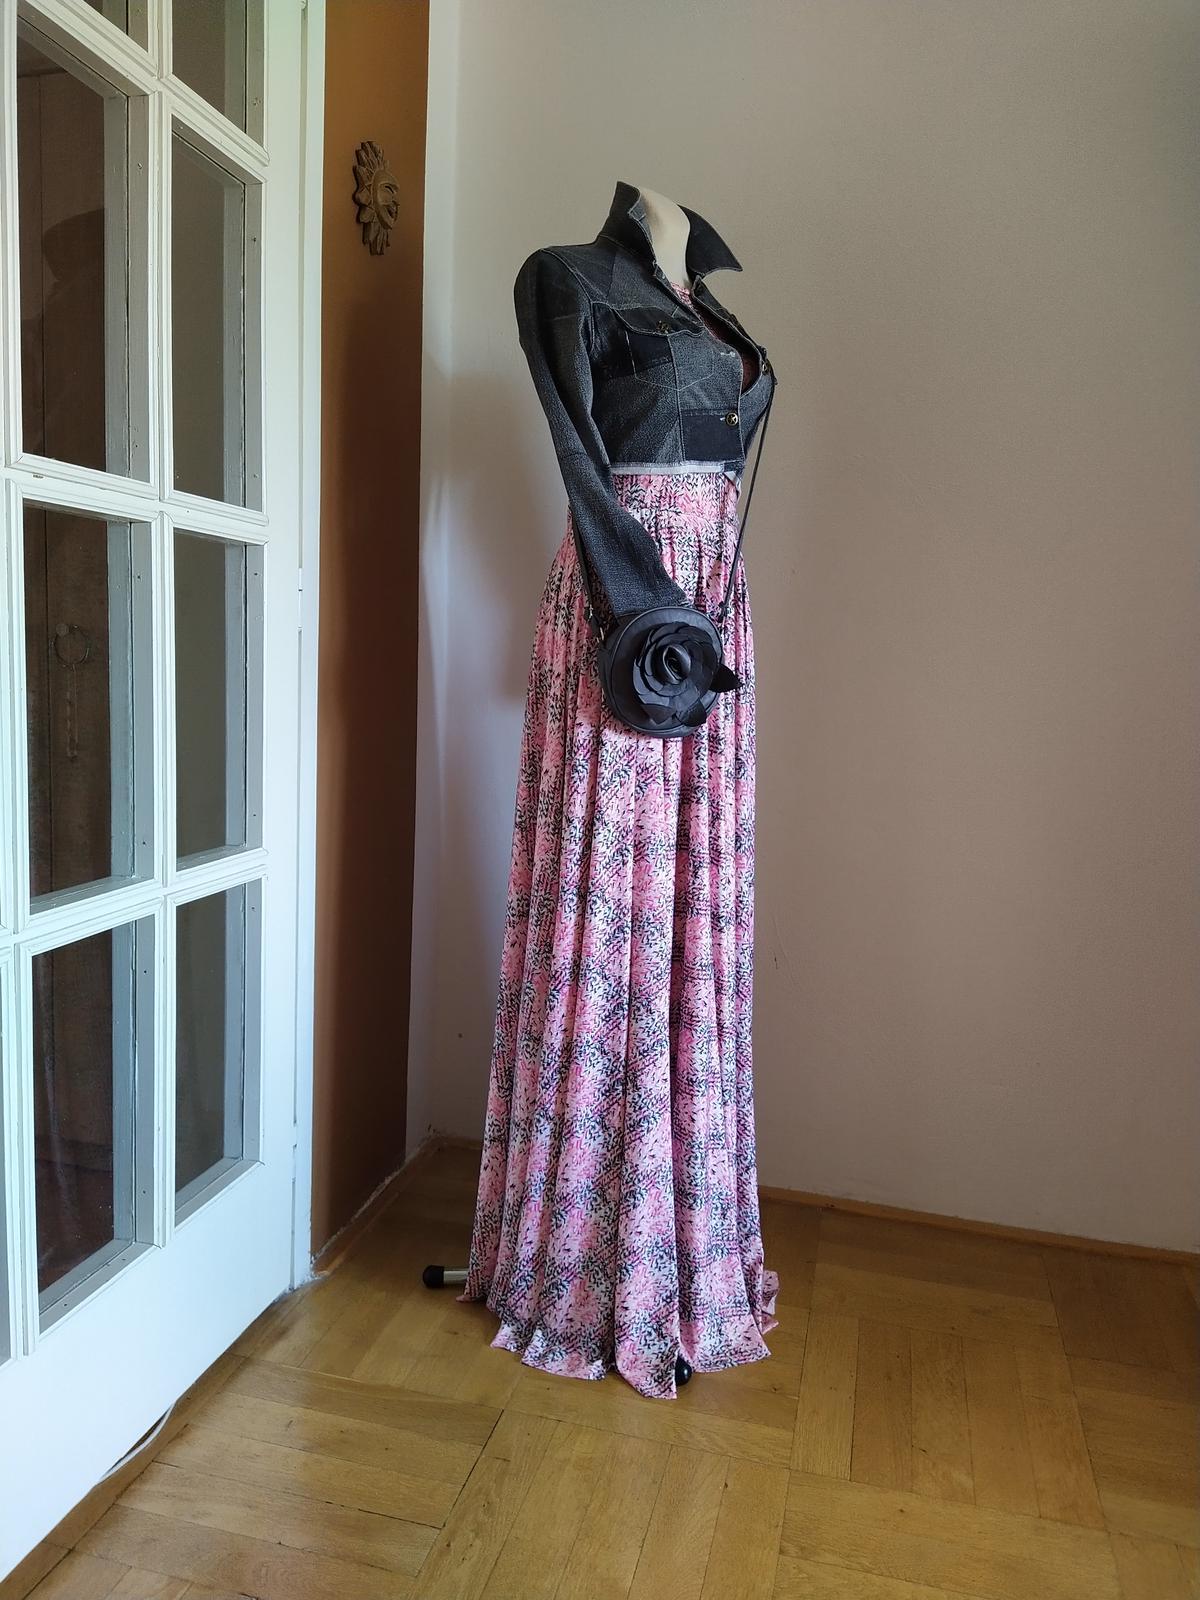 Růžové maxi šaty Nové - Obrázek č. 1